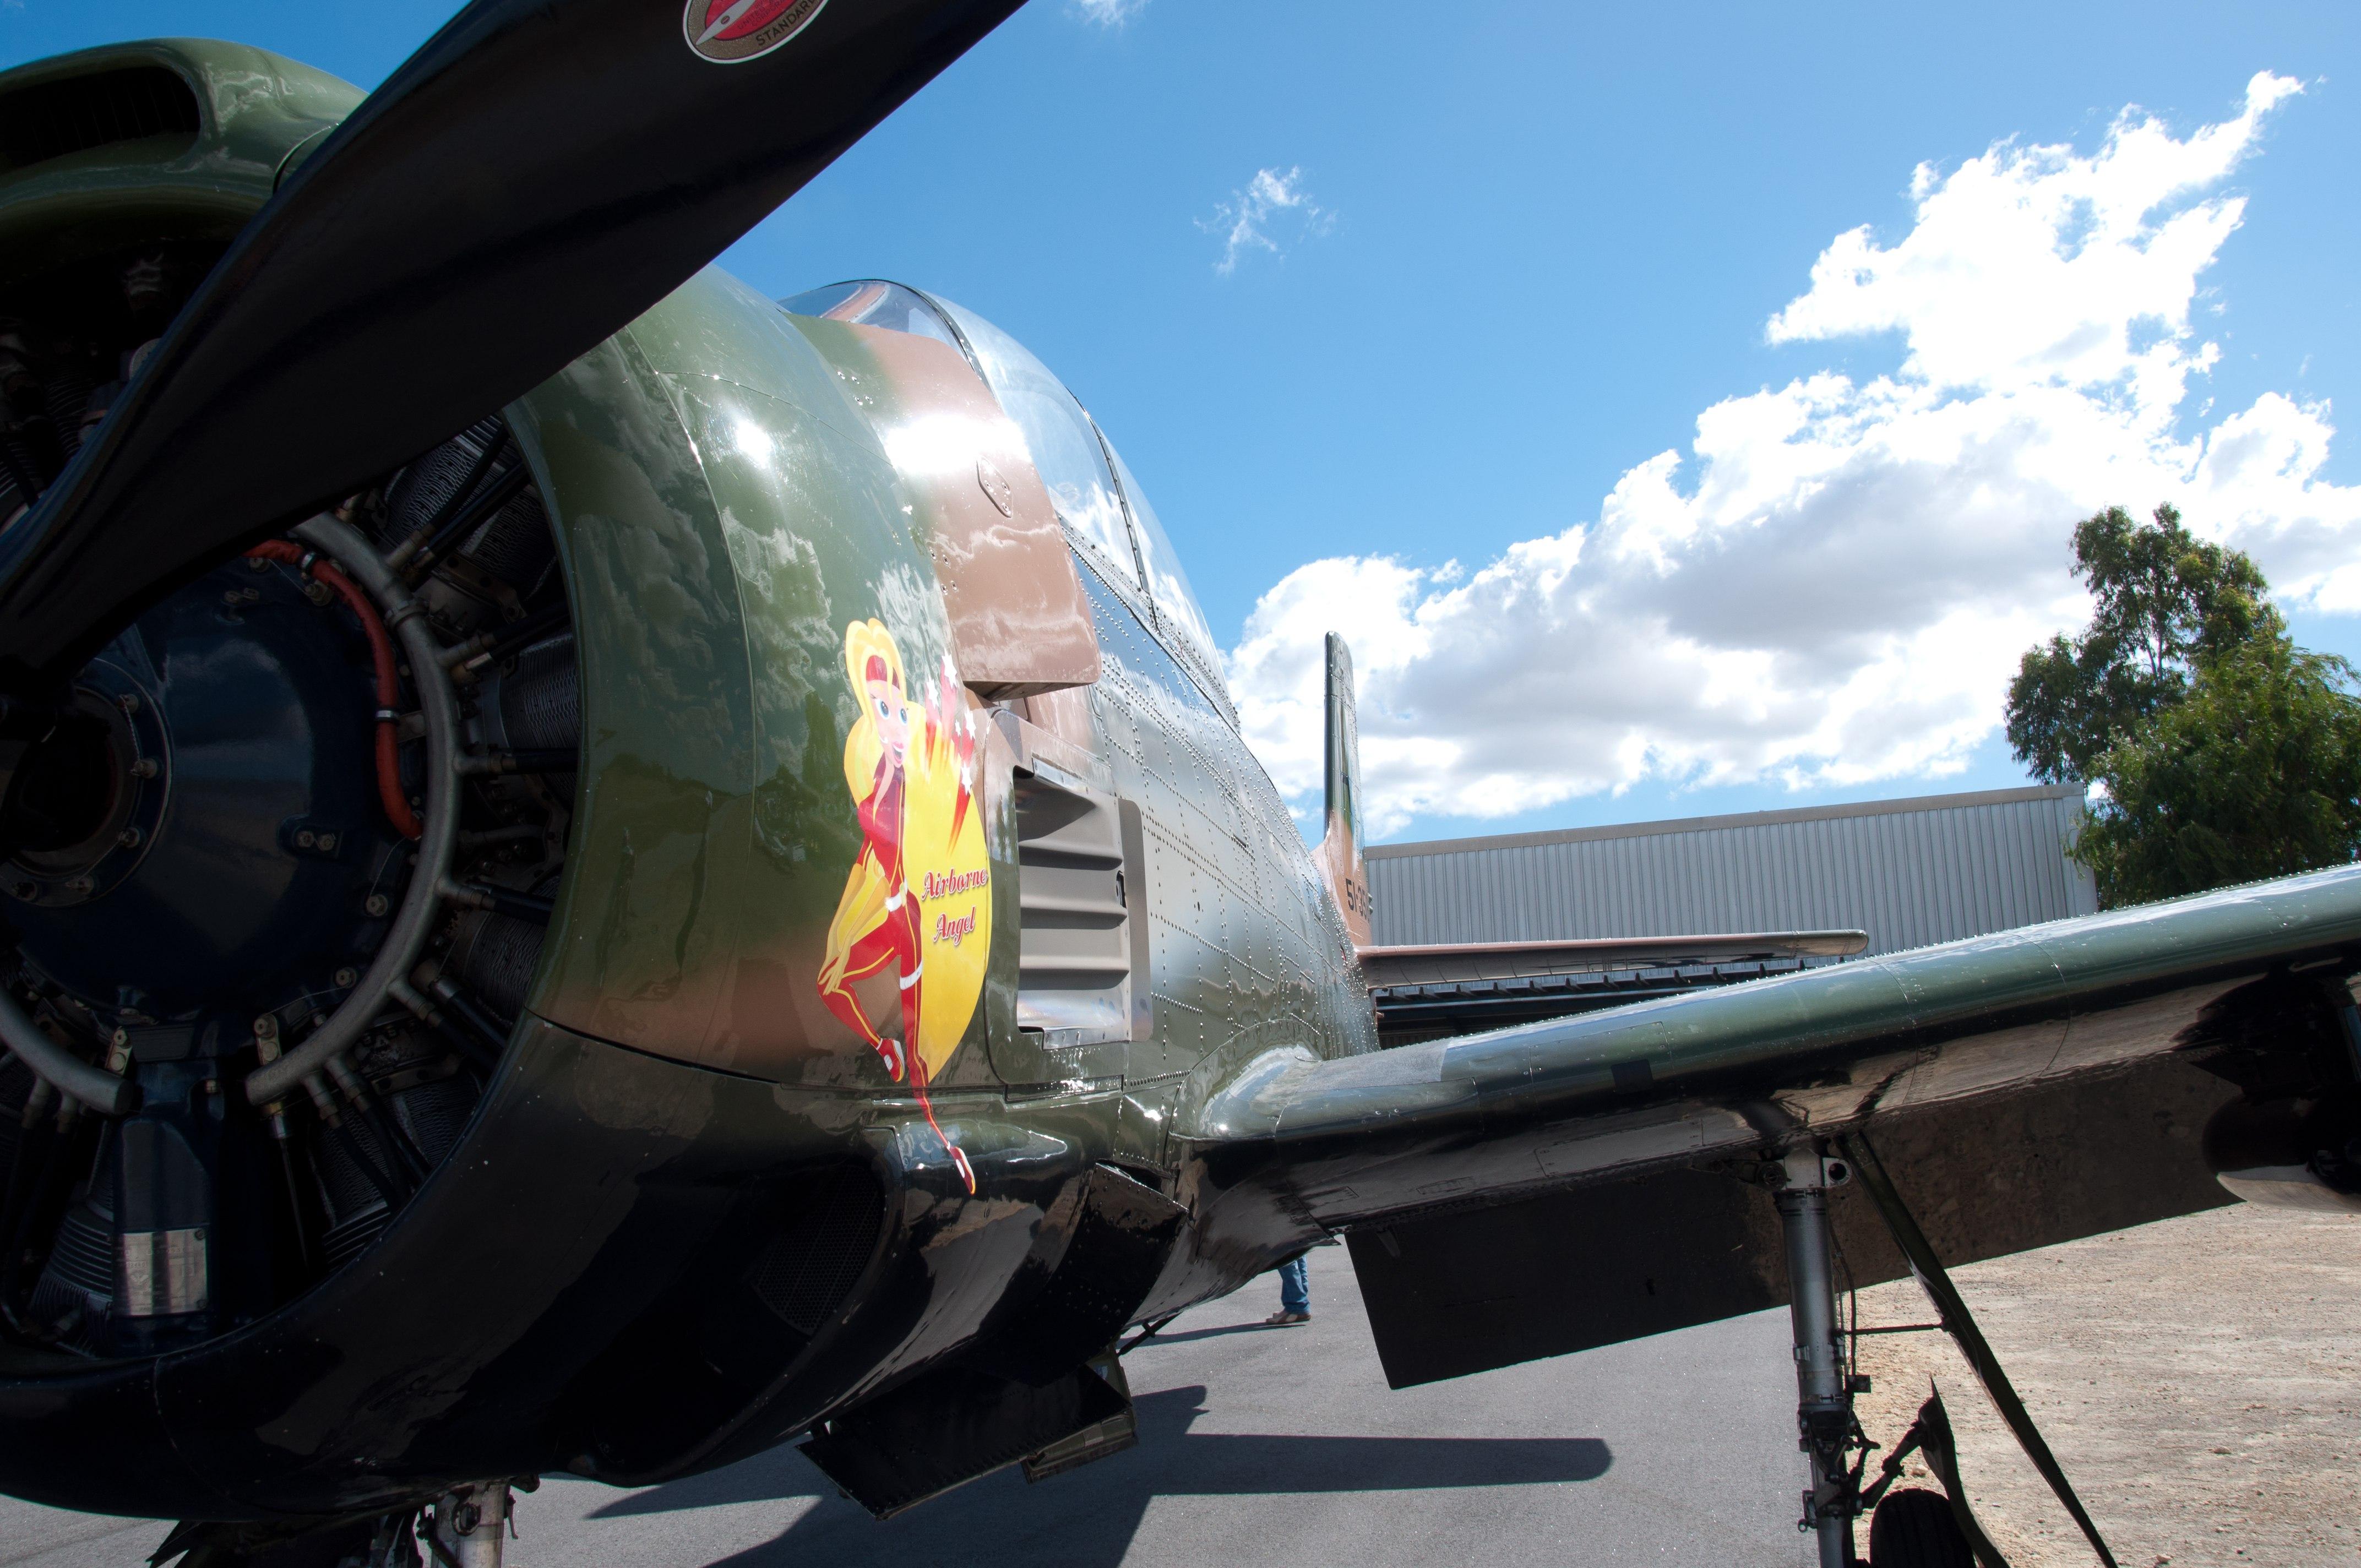 Serpentine SABC SAAA fly in aviation ufc uni flying club jandakot trojan warbird